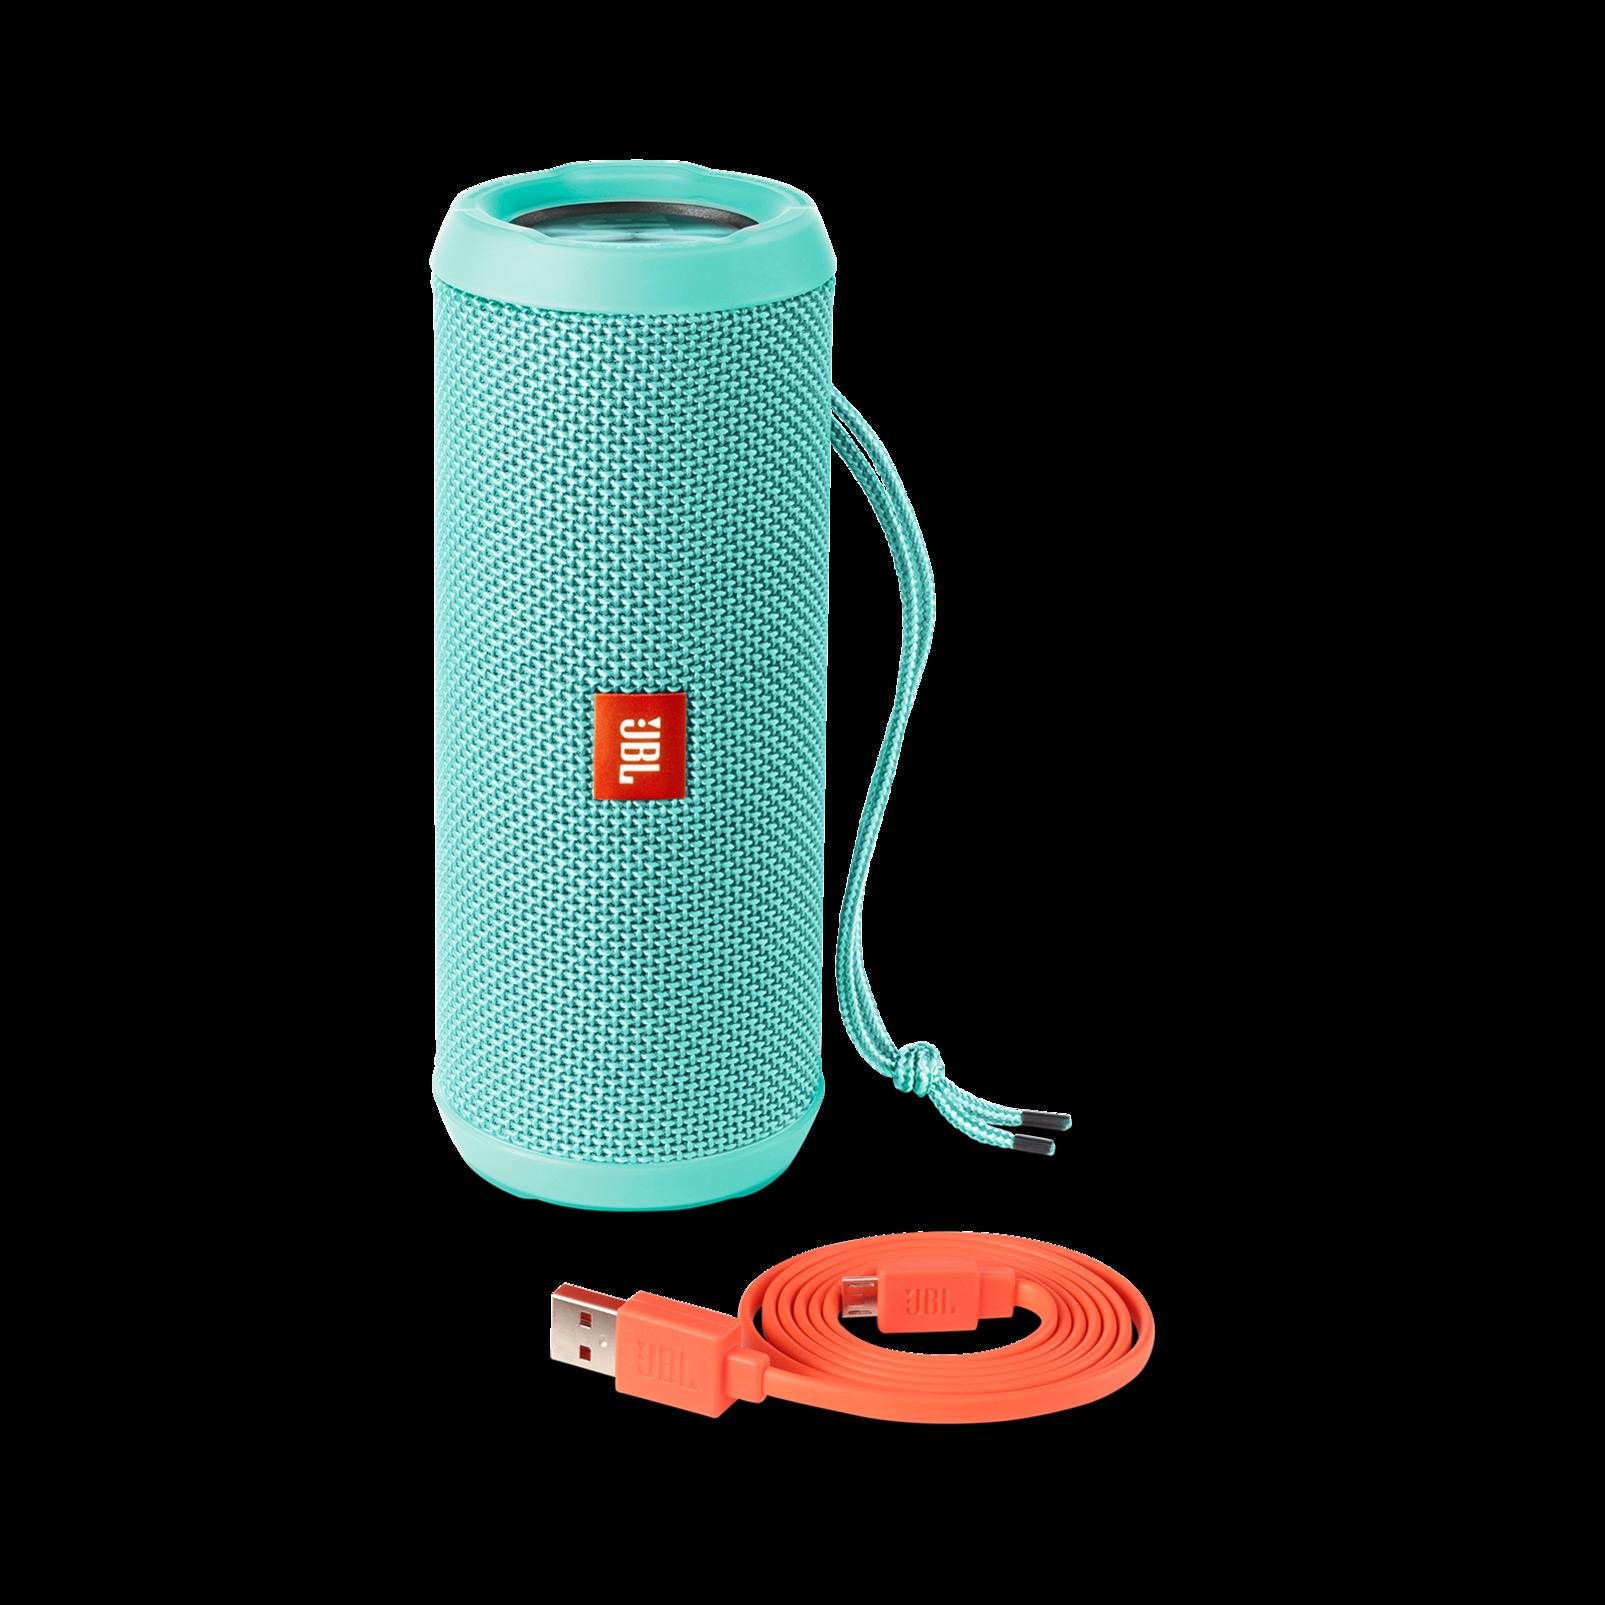 Jbl Flip 3 Daftar Lengkap Speaker Bluetooth Waterproof 2 Portable Merah C